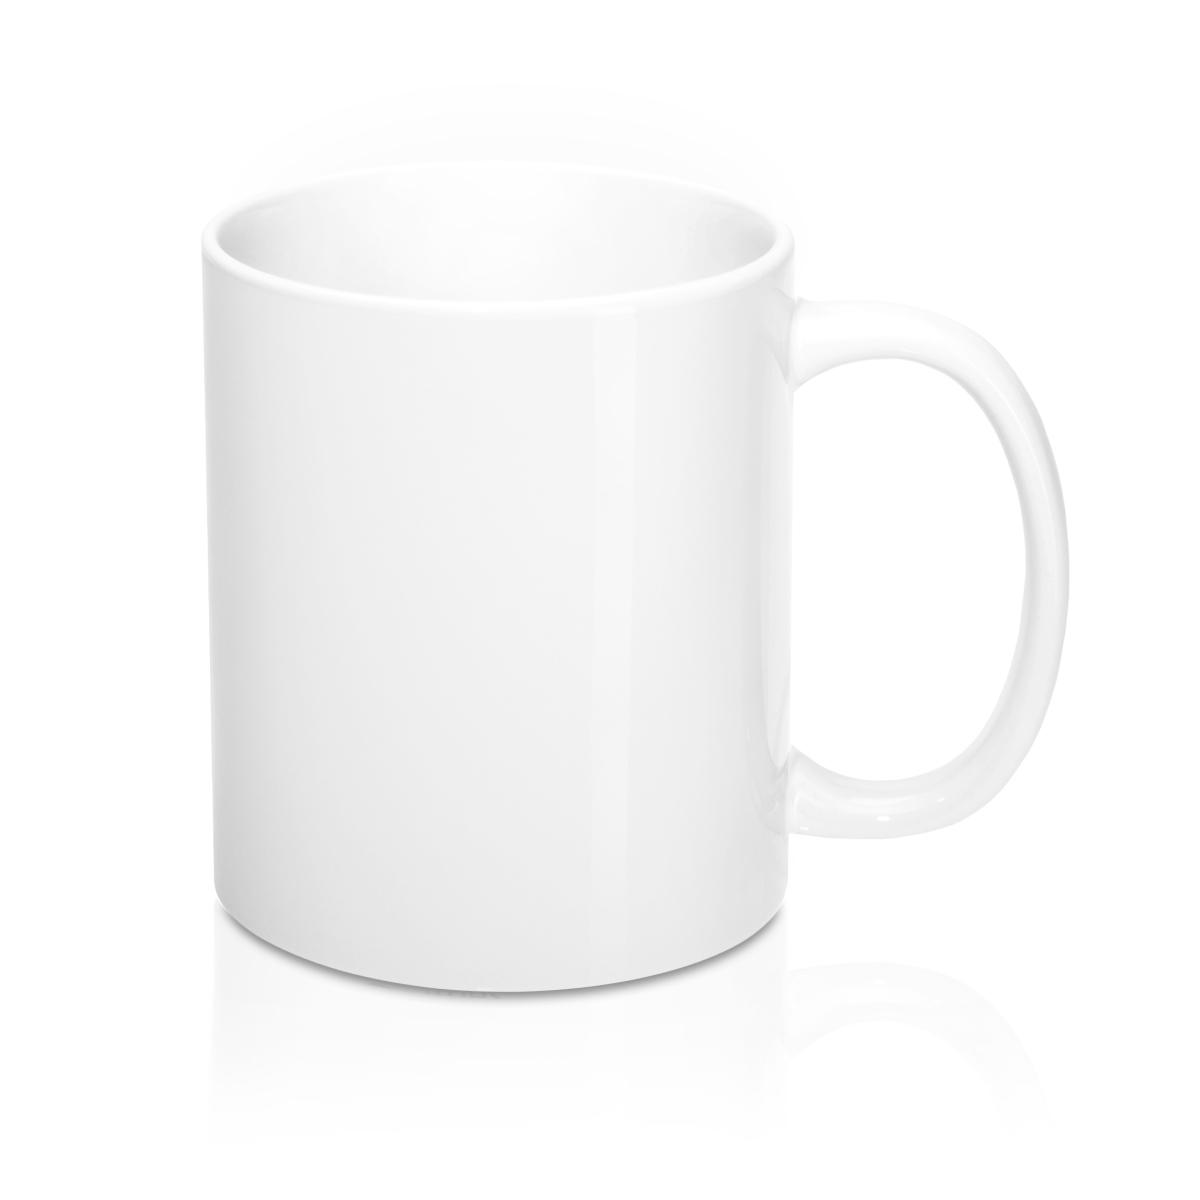 tdps coffee mug 11oz the david pakman show